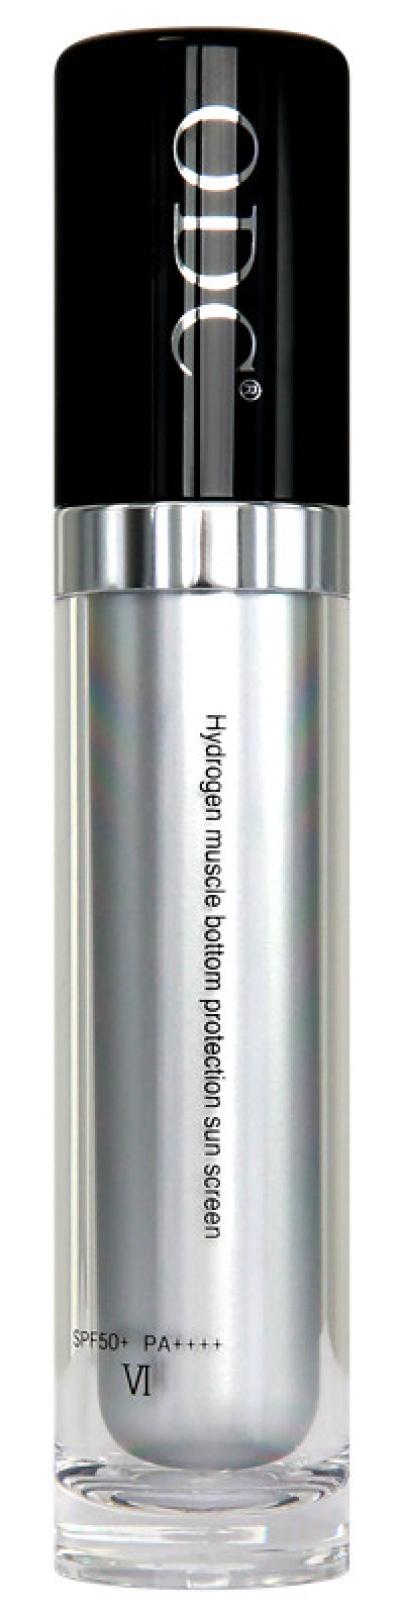 [F6]Hydrogen UV Protection Sunscreen Base Makeup VI